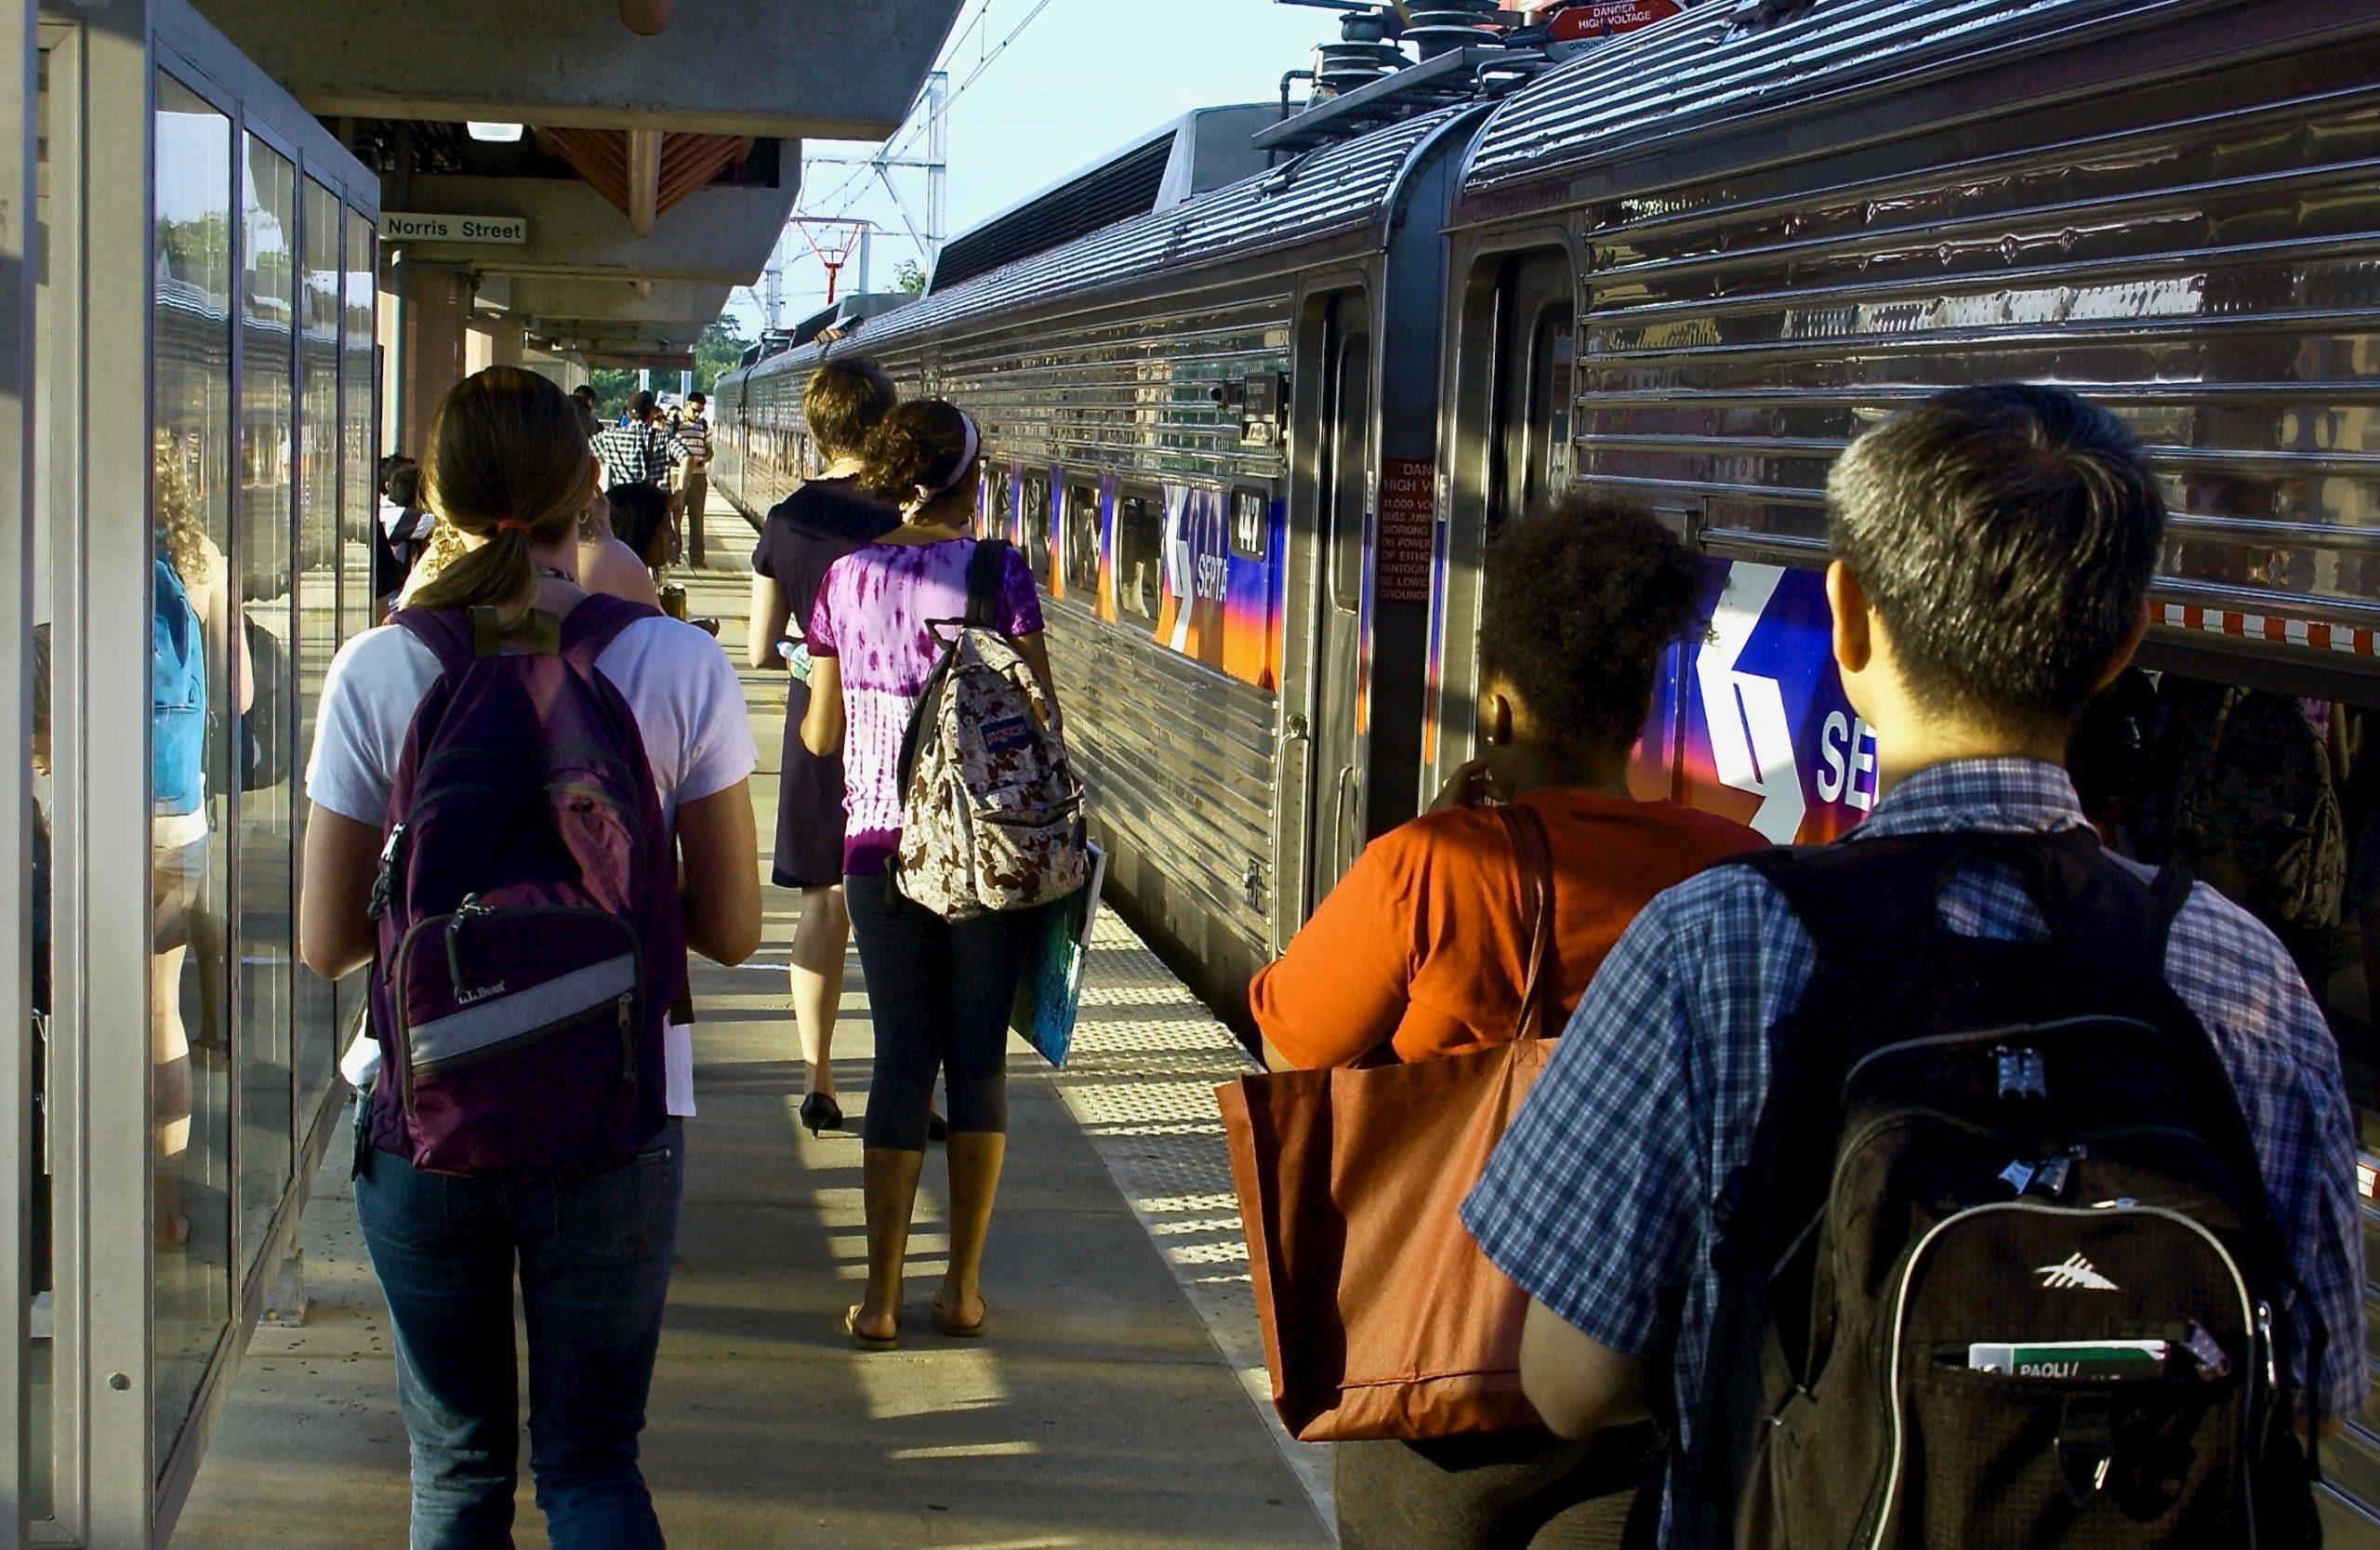 People of the Train Platform; Temple University SEPTA Station; Philadelphia, Pennsylvania, USA